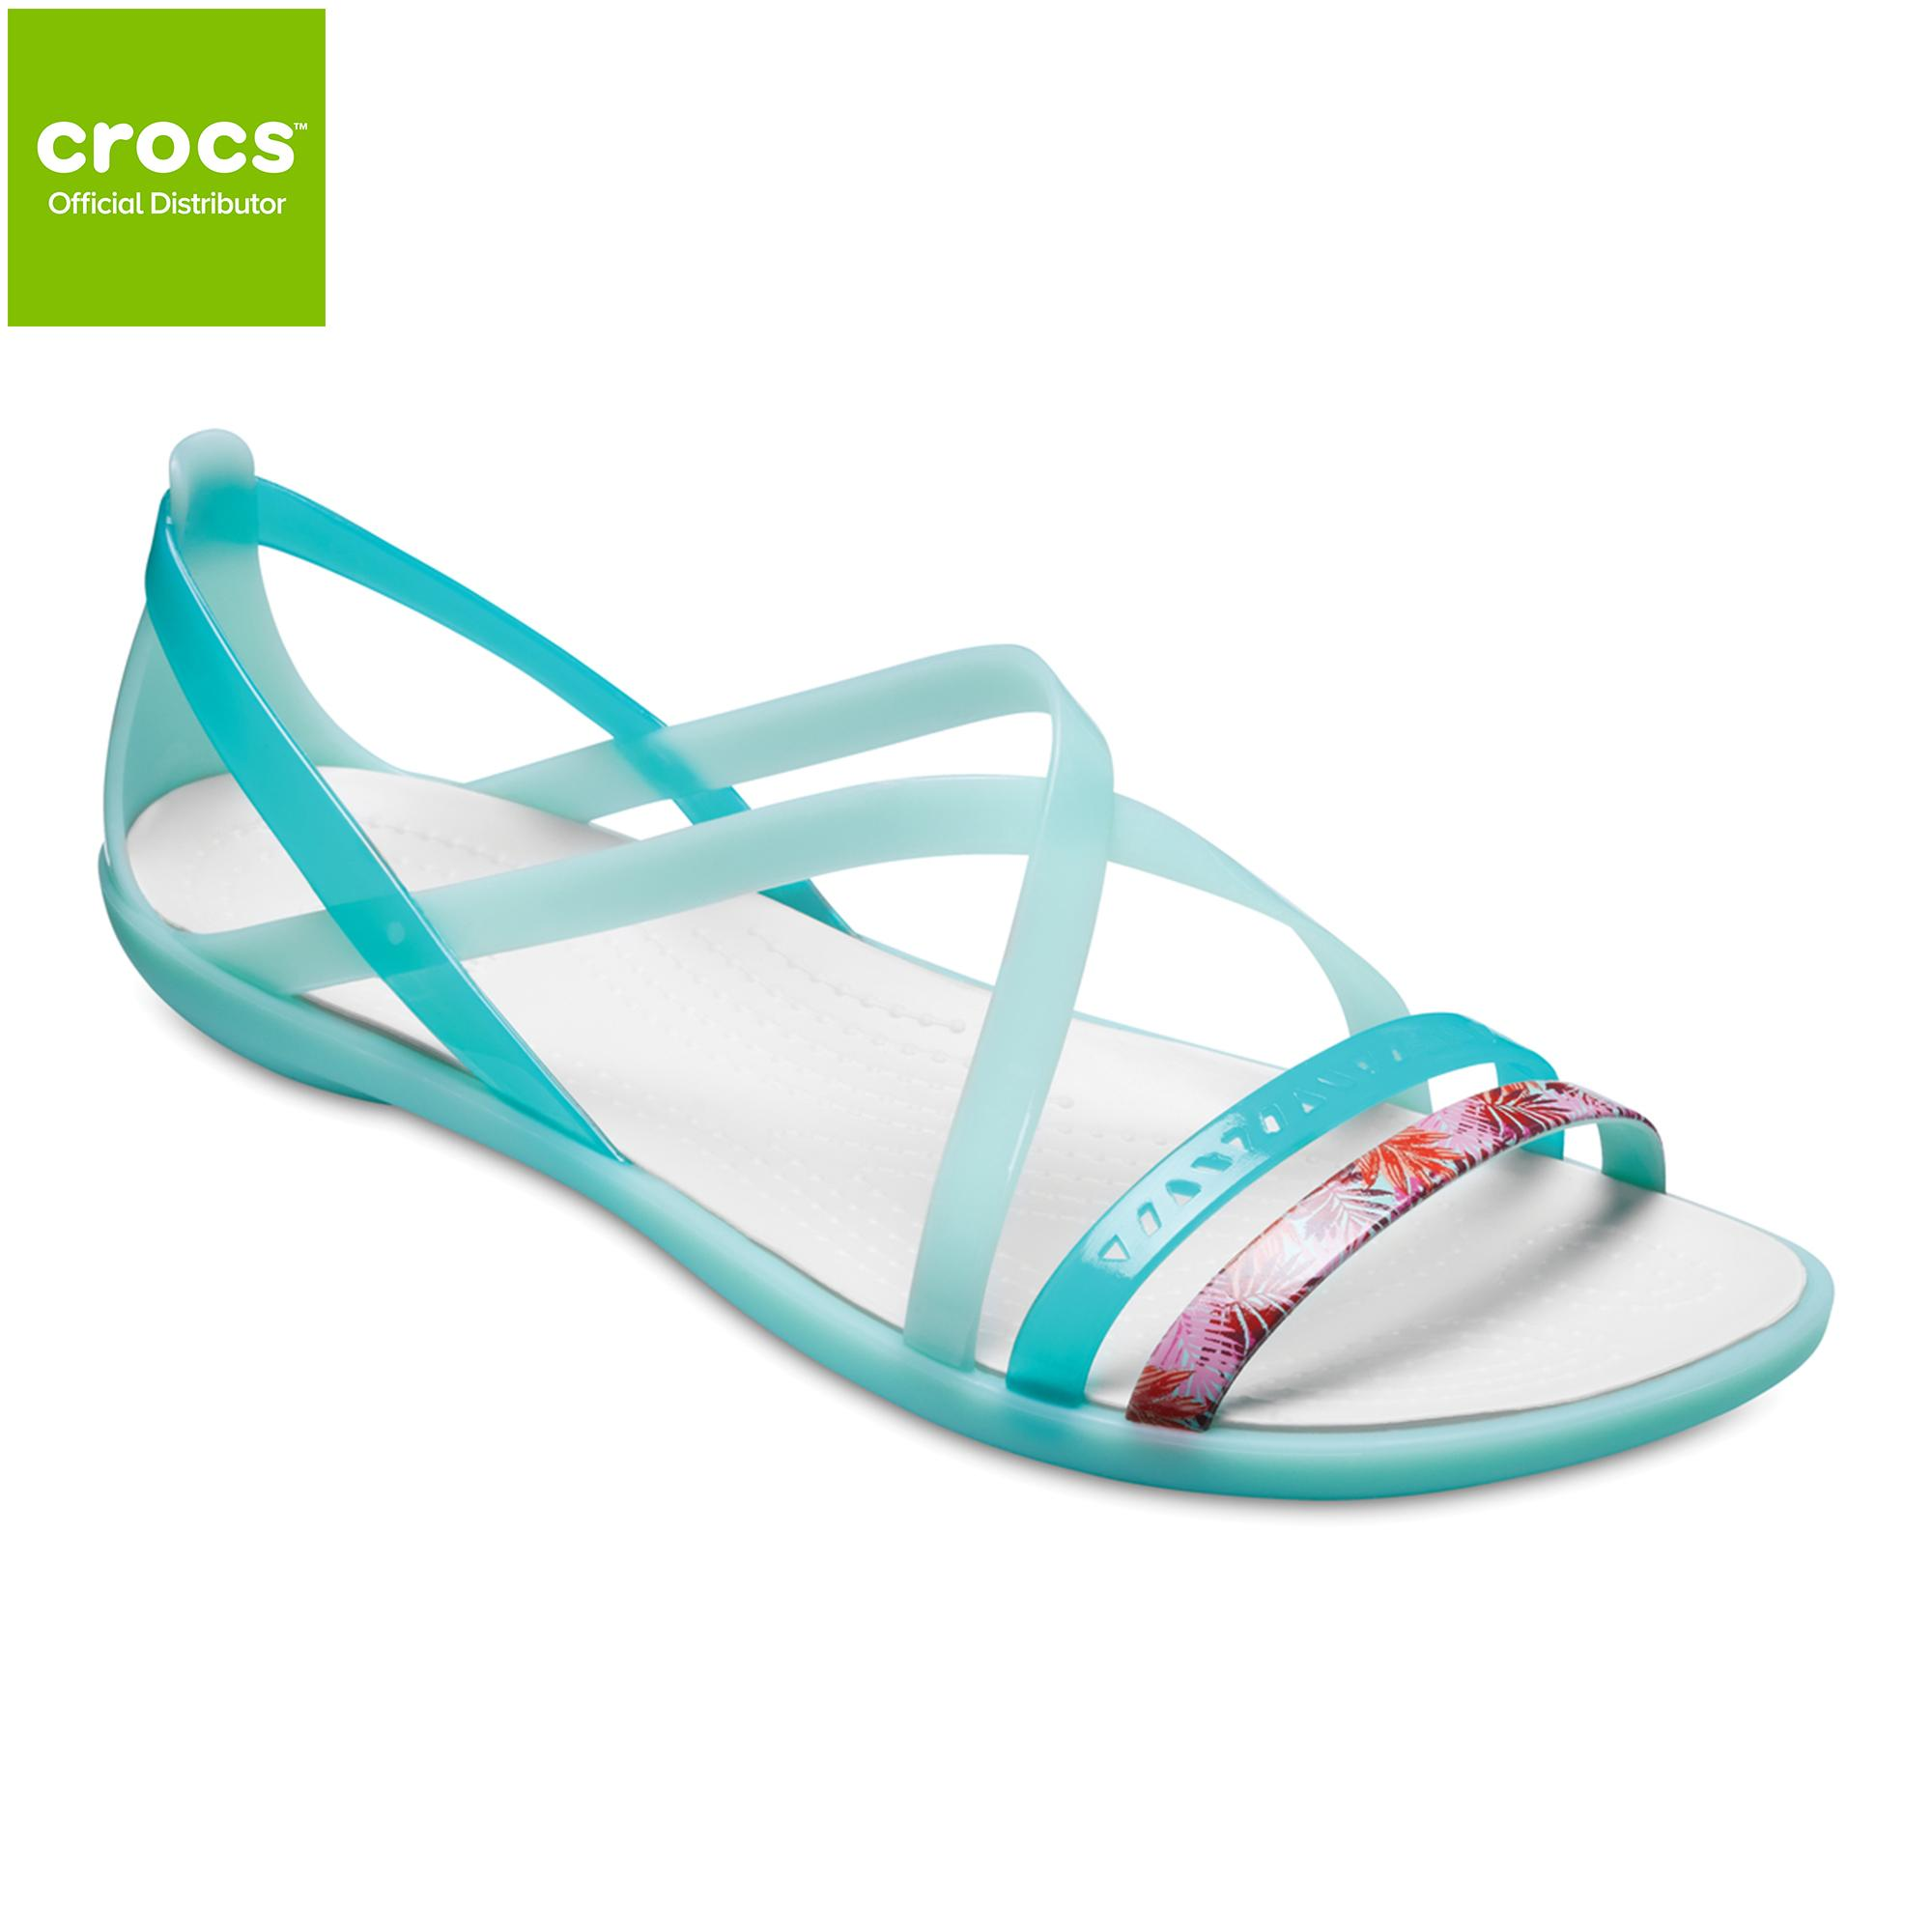 239390146076a Flat Sandals for Women for sale - Summer Sandals online brands ...